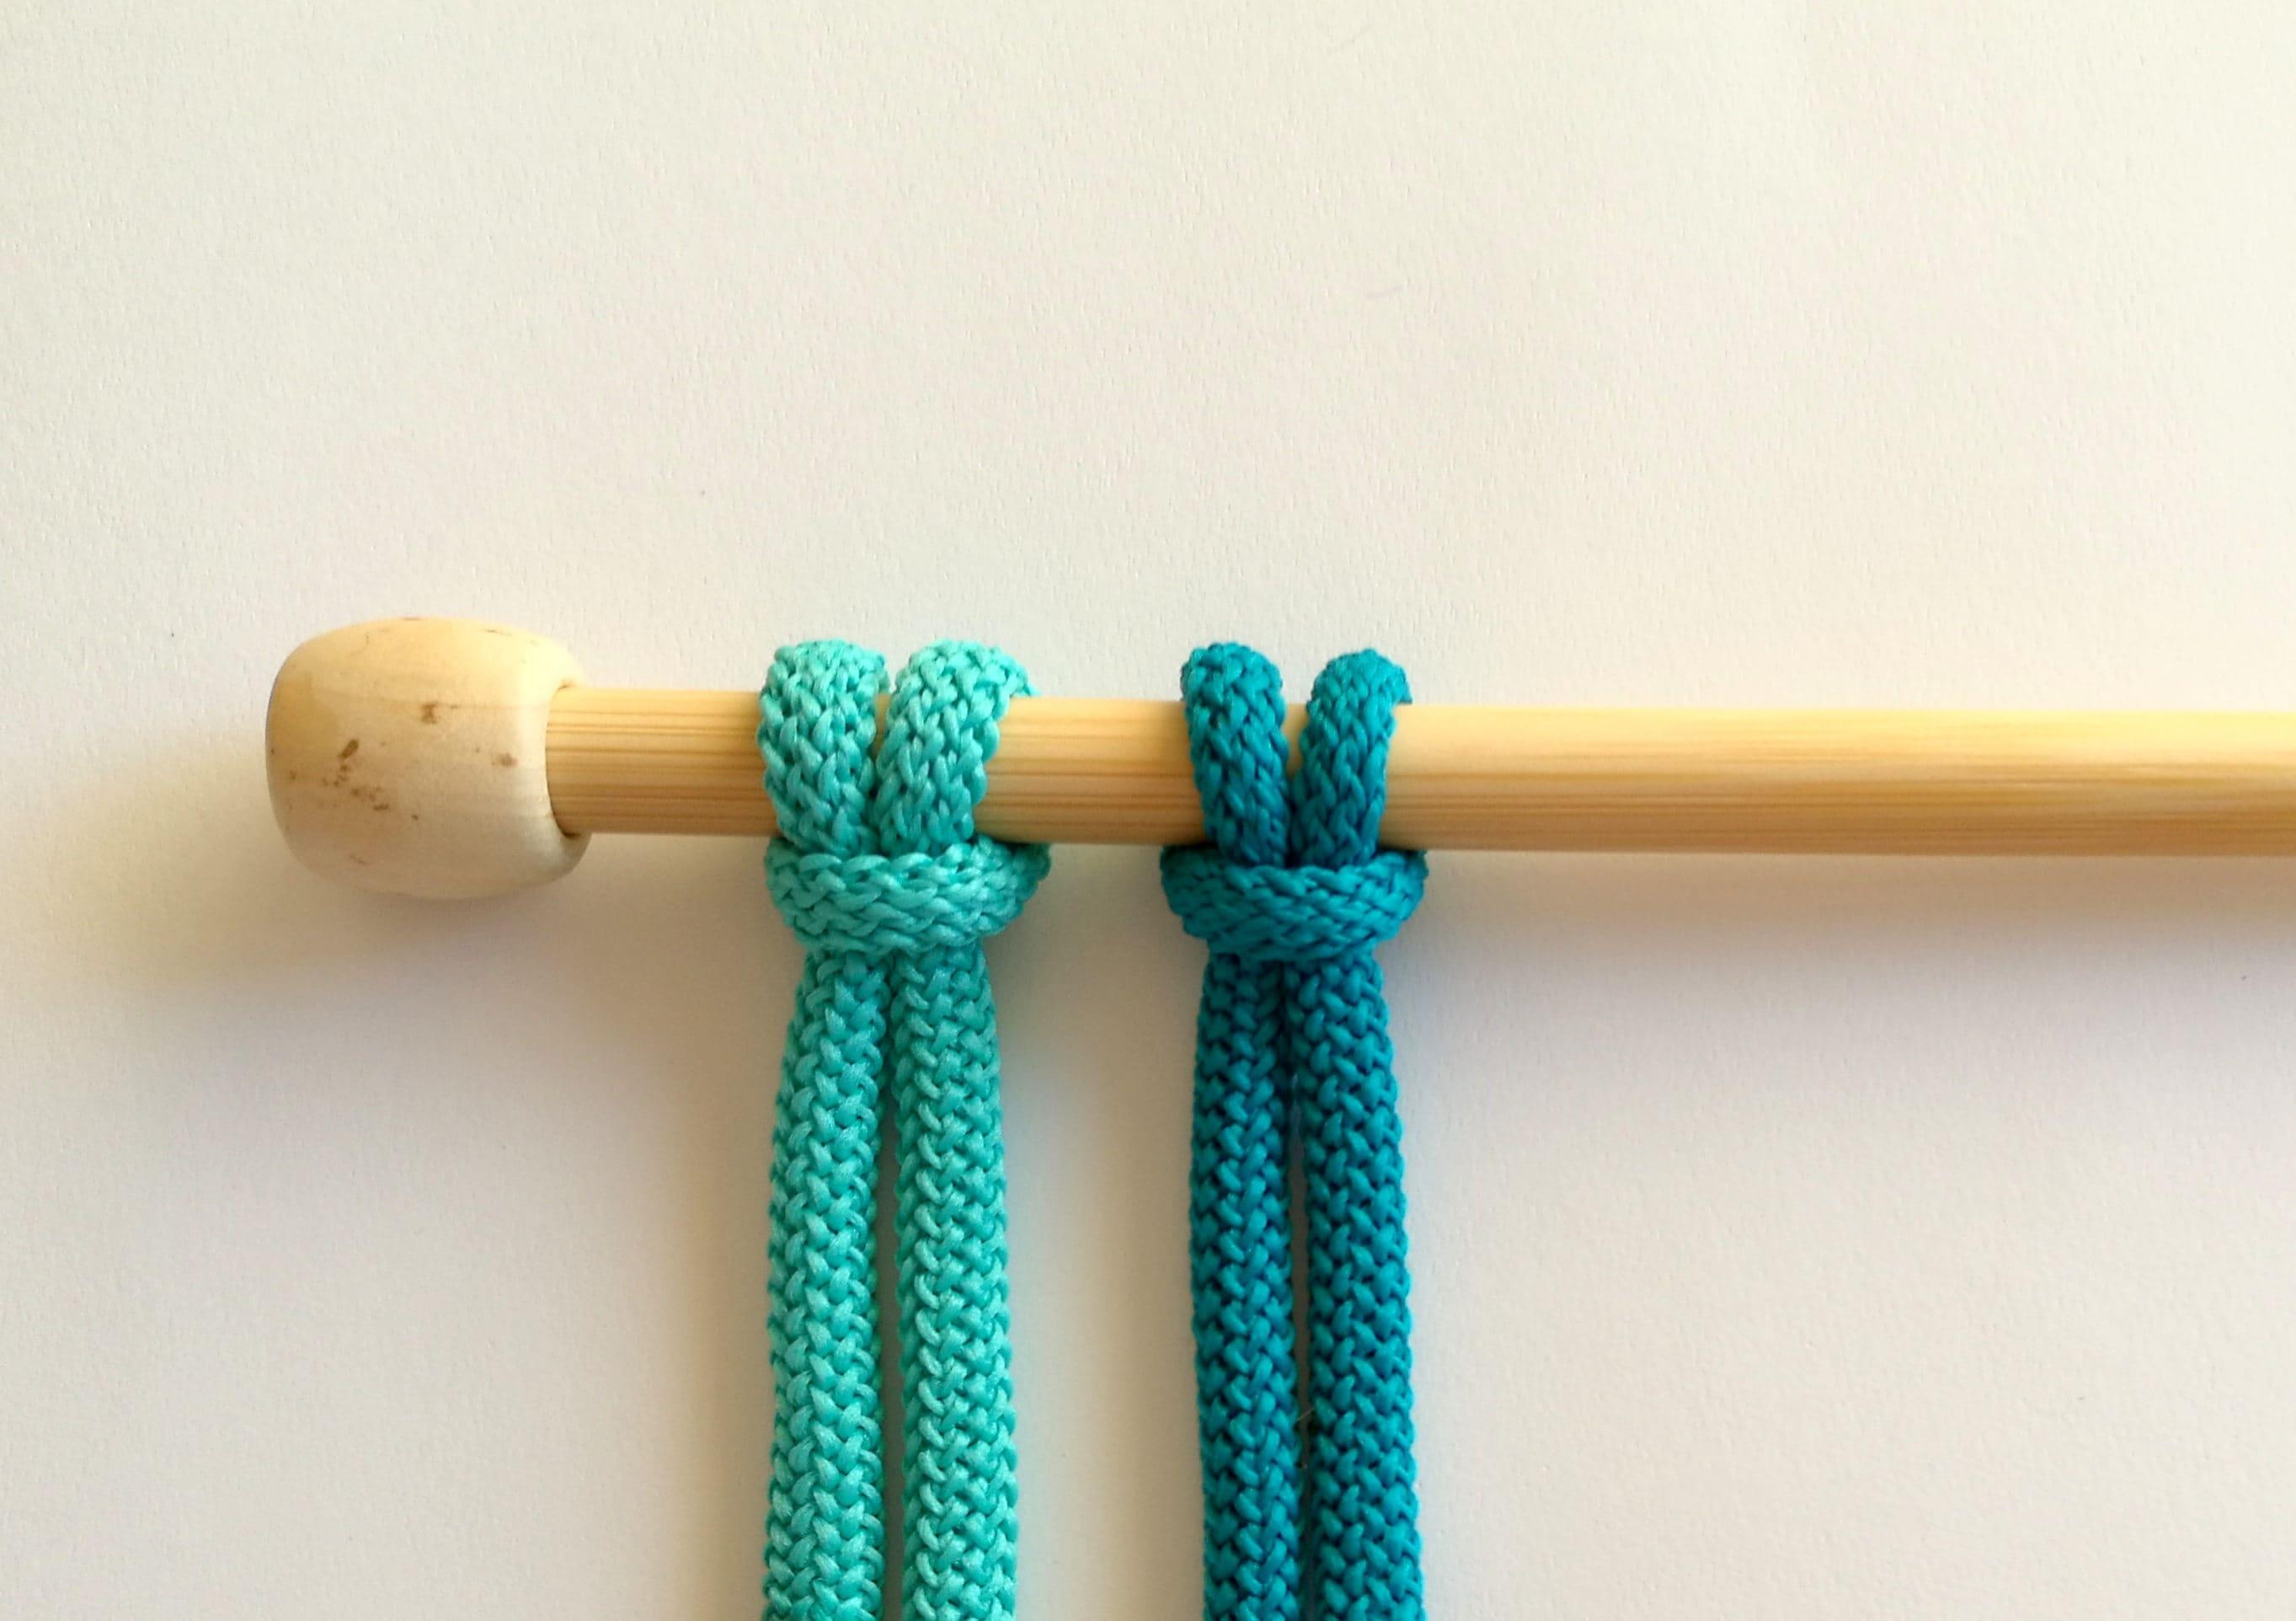 cordon de 6 mm de corde en macram chunky couleur corde etsy. Black Bedroom Furniture Sets. Home Design Ideas